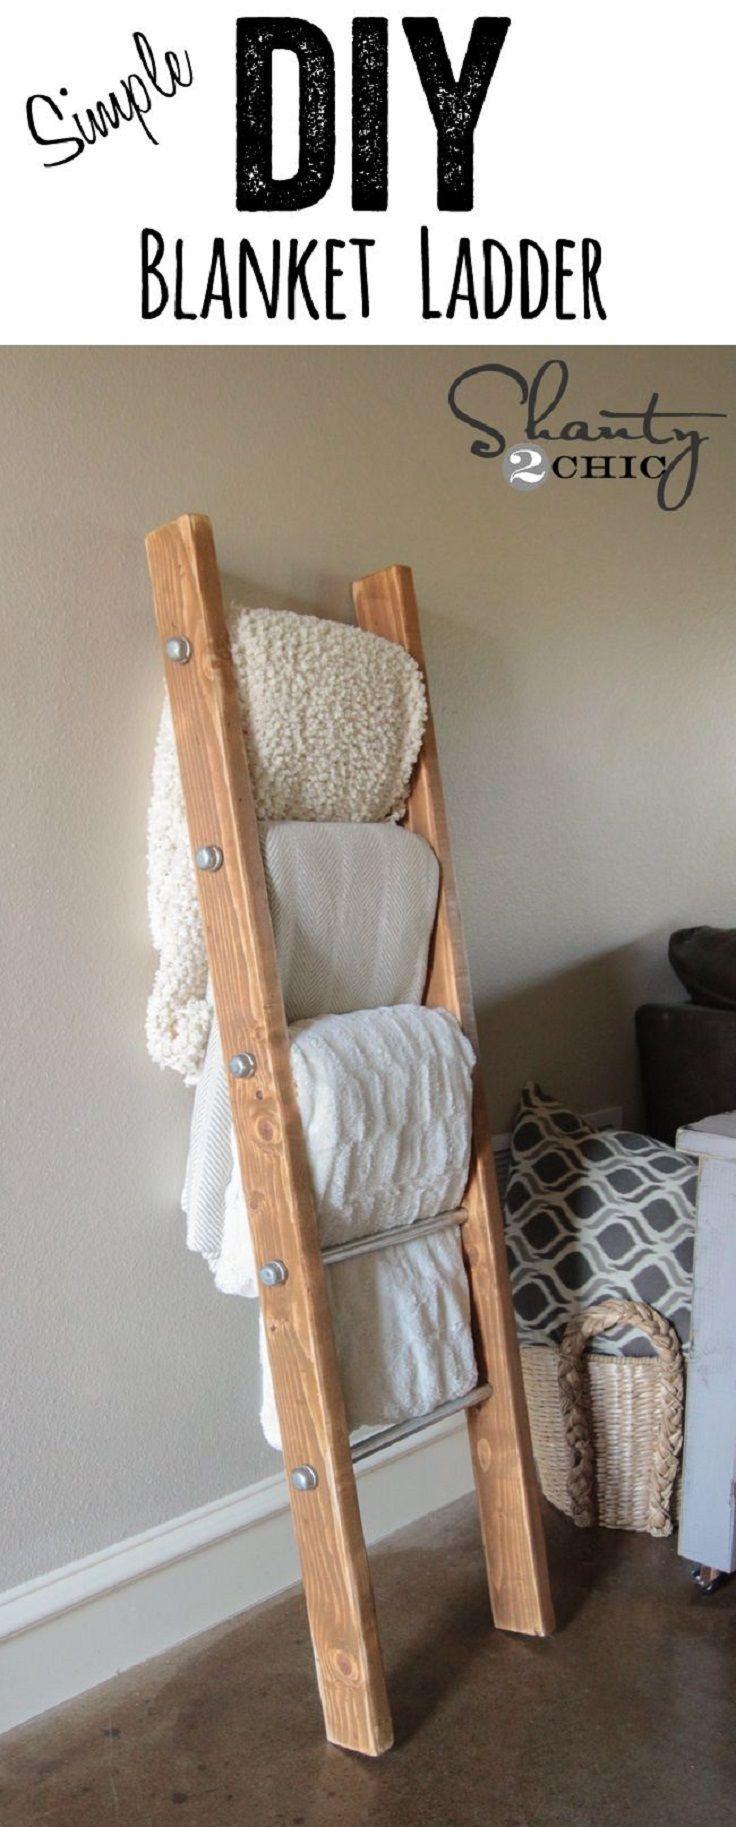 Diy room decor a rustic blanket ladder diy woodworking